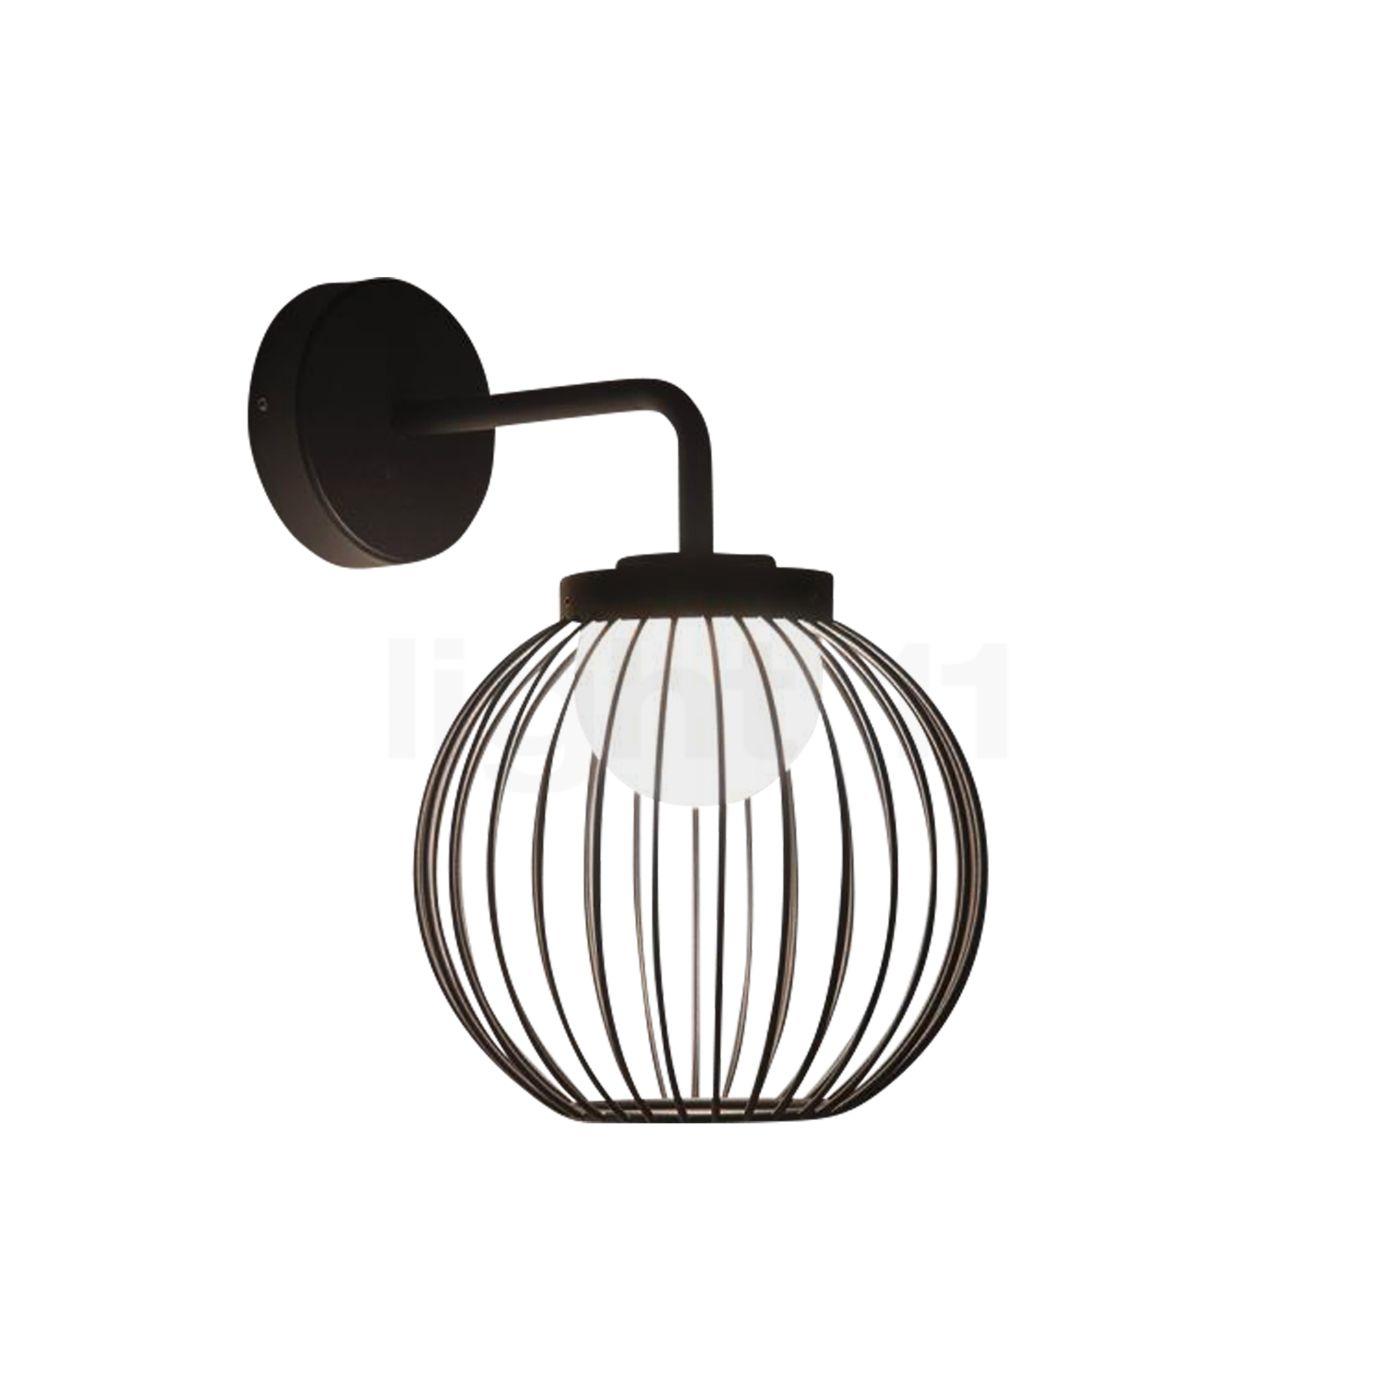 Loum Boho Wandleuchte LED, schwarz 401-90019600